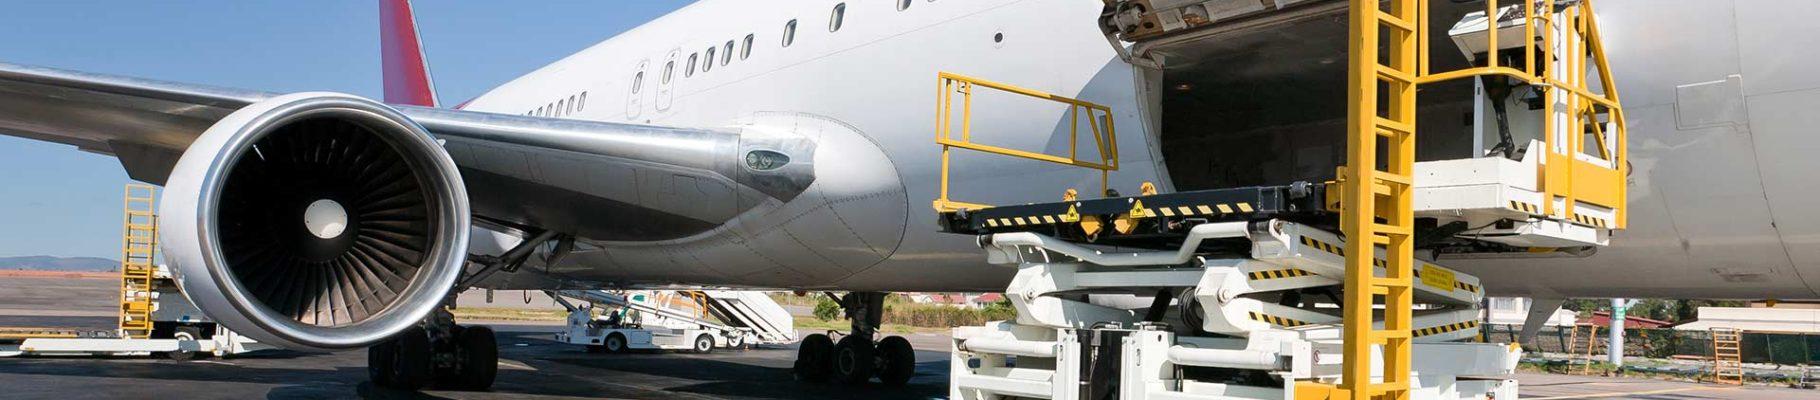 Cyberfreight Pharma logistics - luchtvracht airfreight